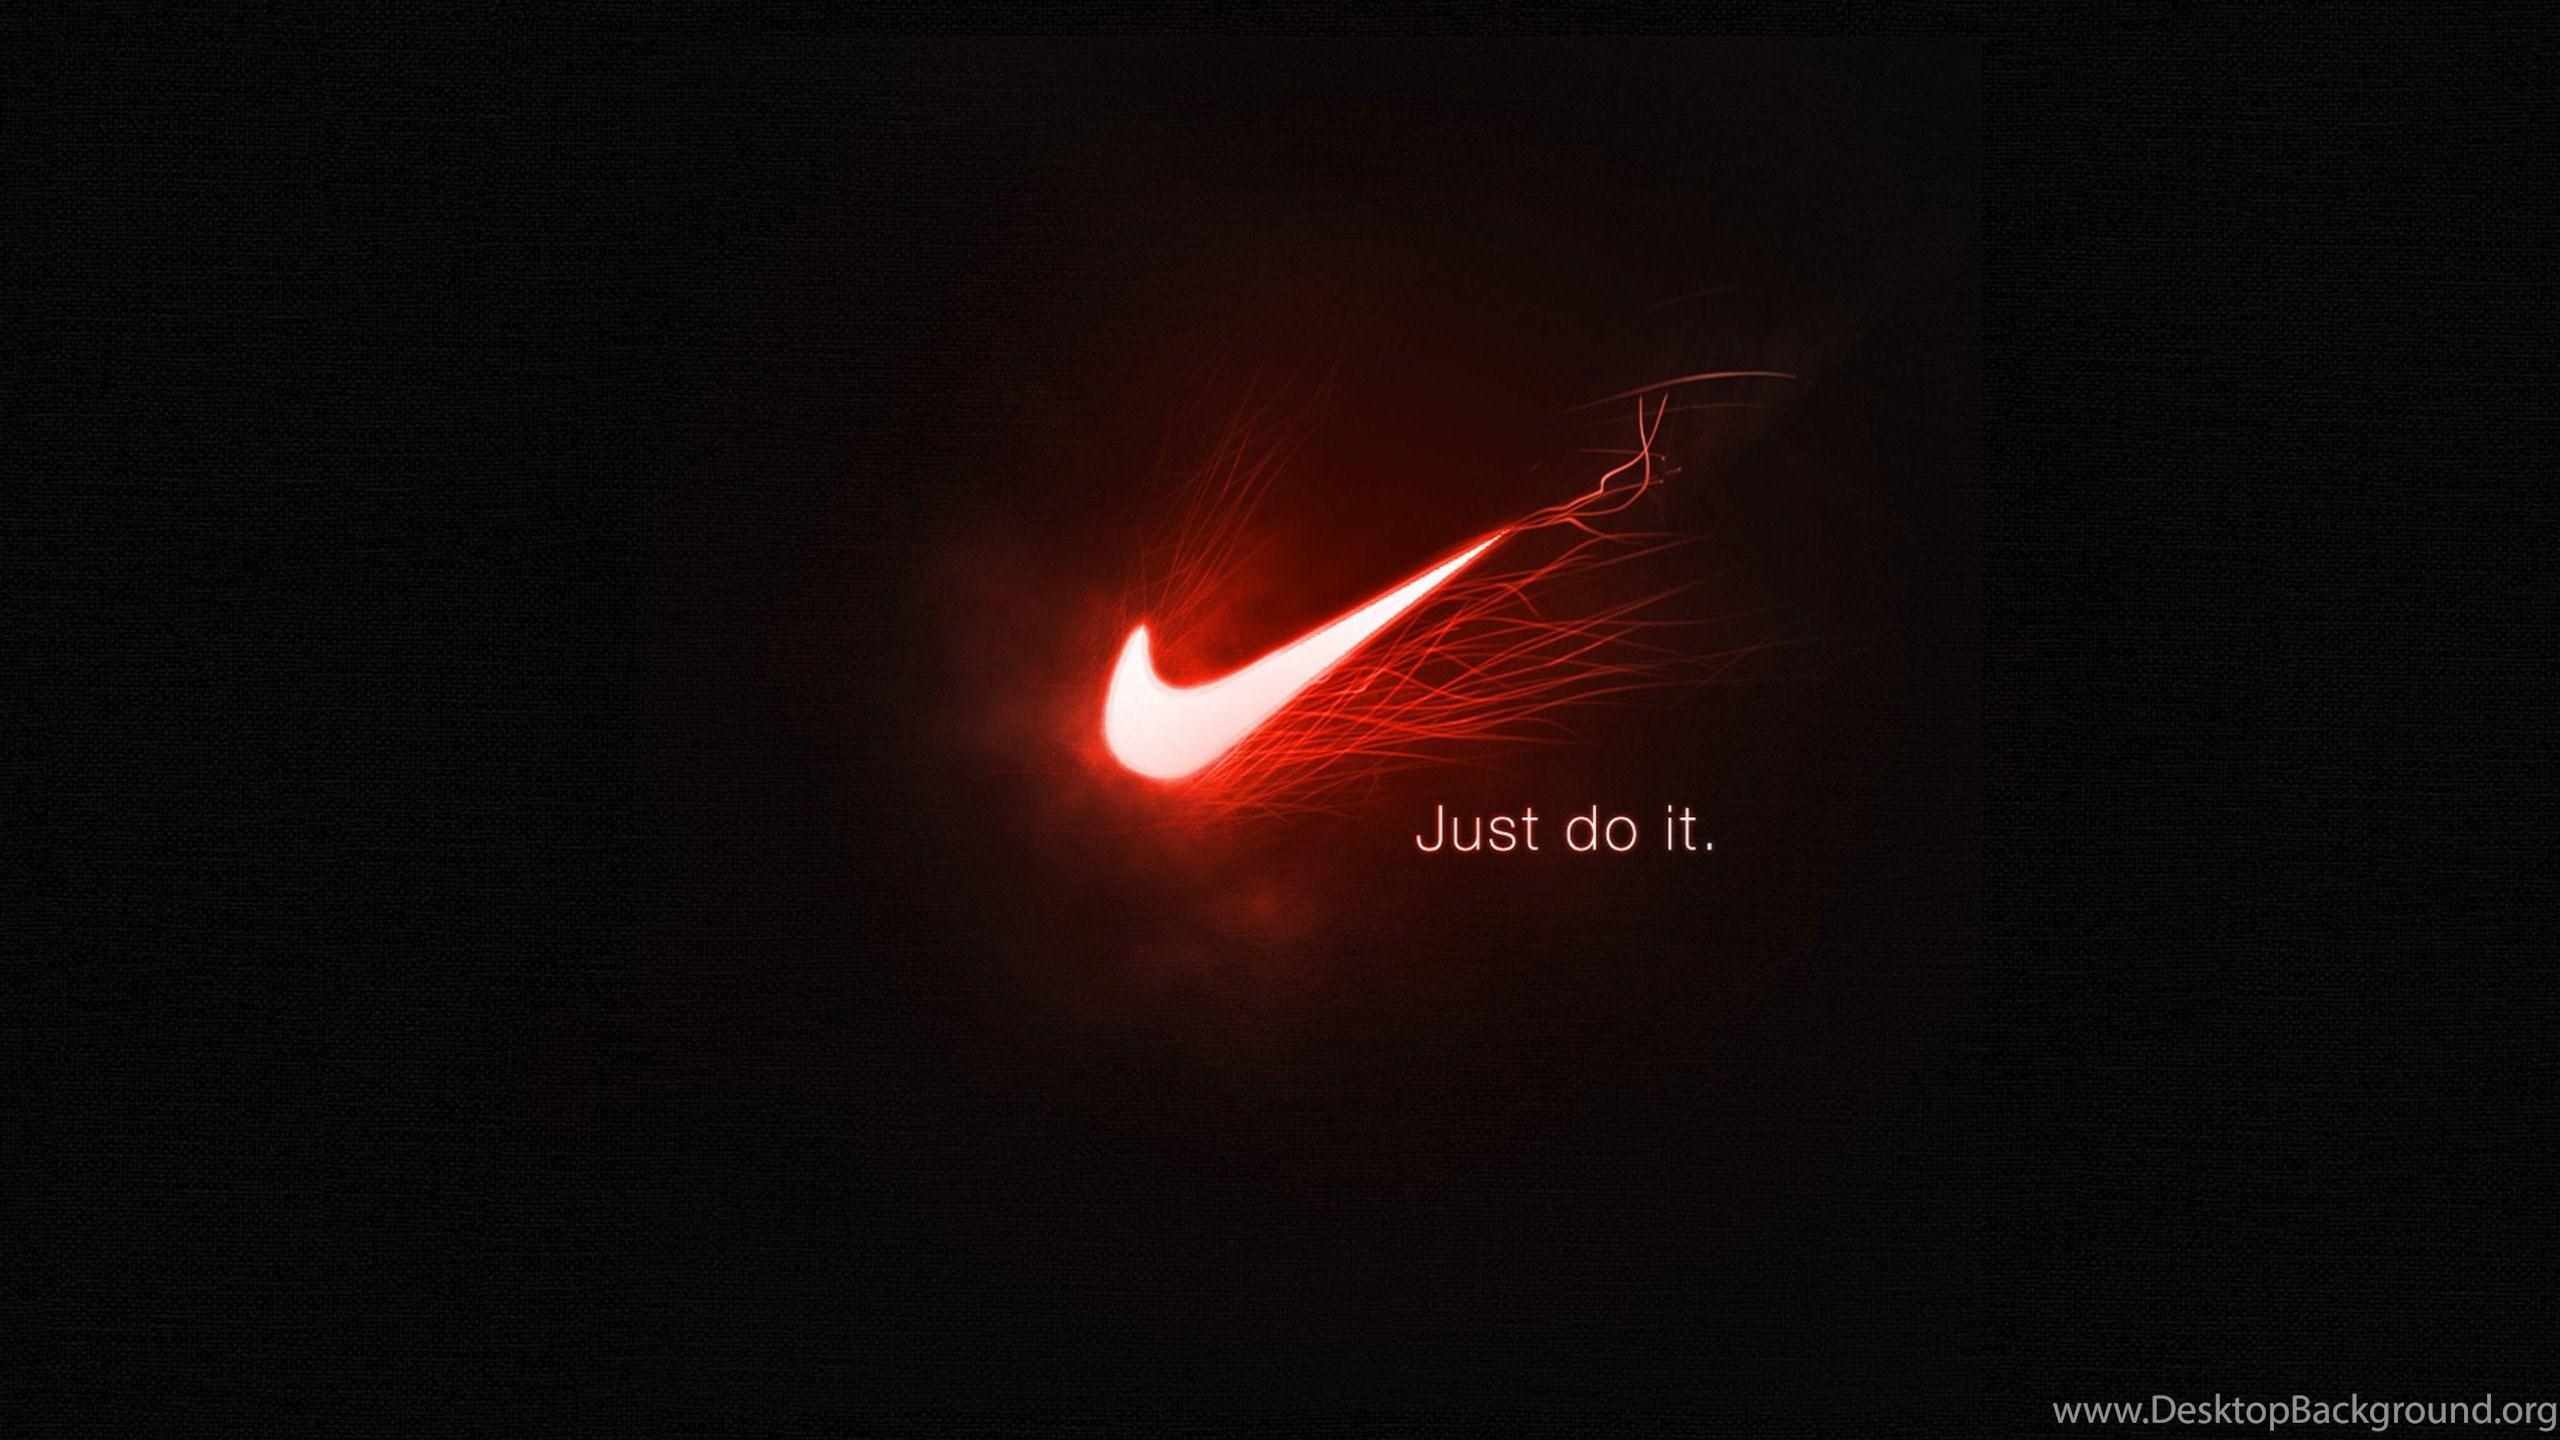 Nike Sign Of Fire Wallpapers Hd Hd Desktop Wallpapers Desktop